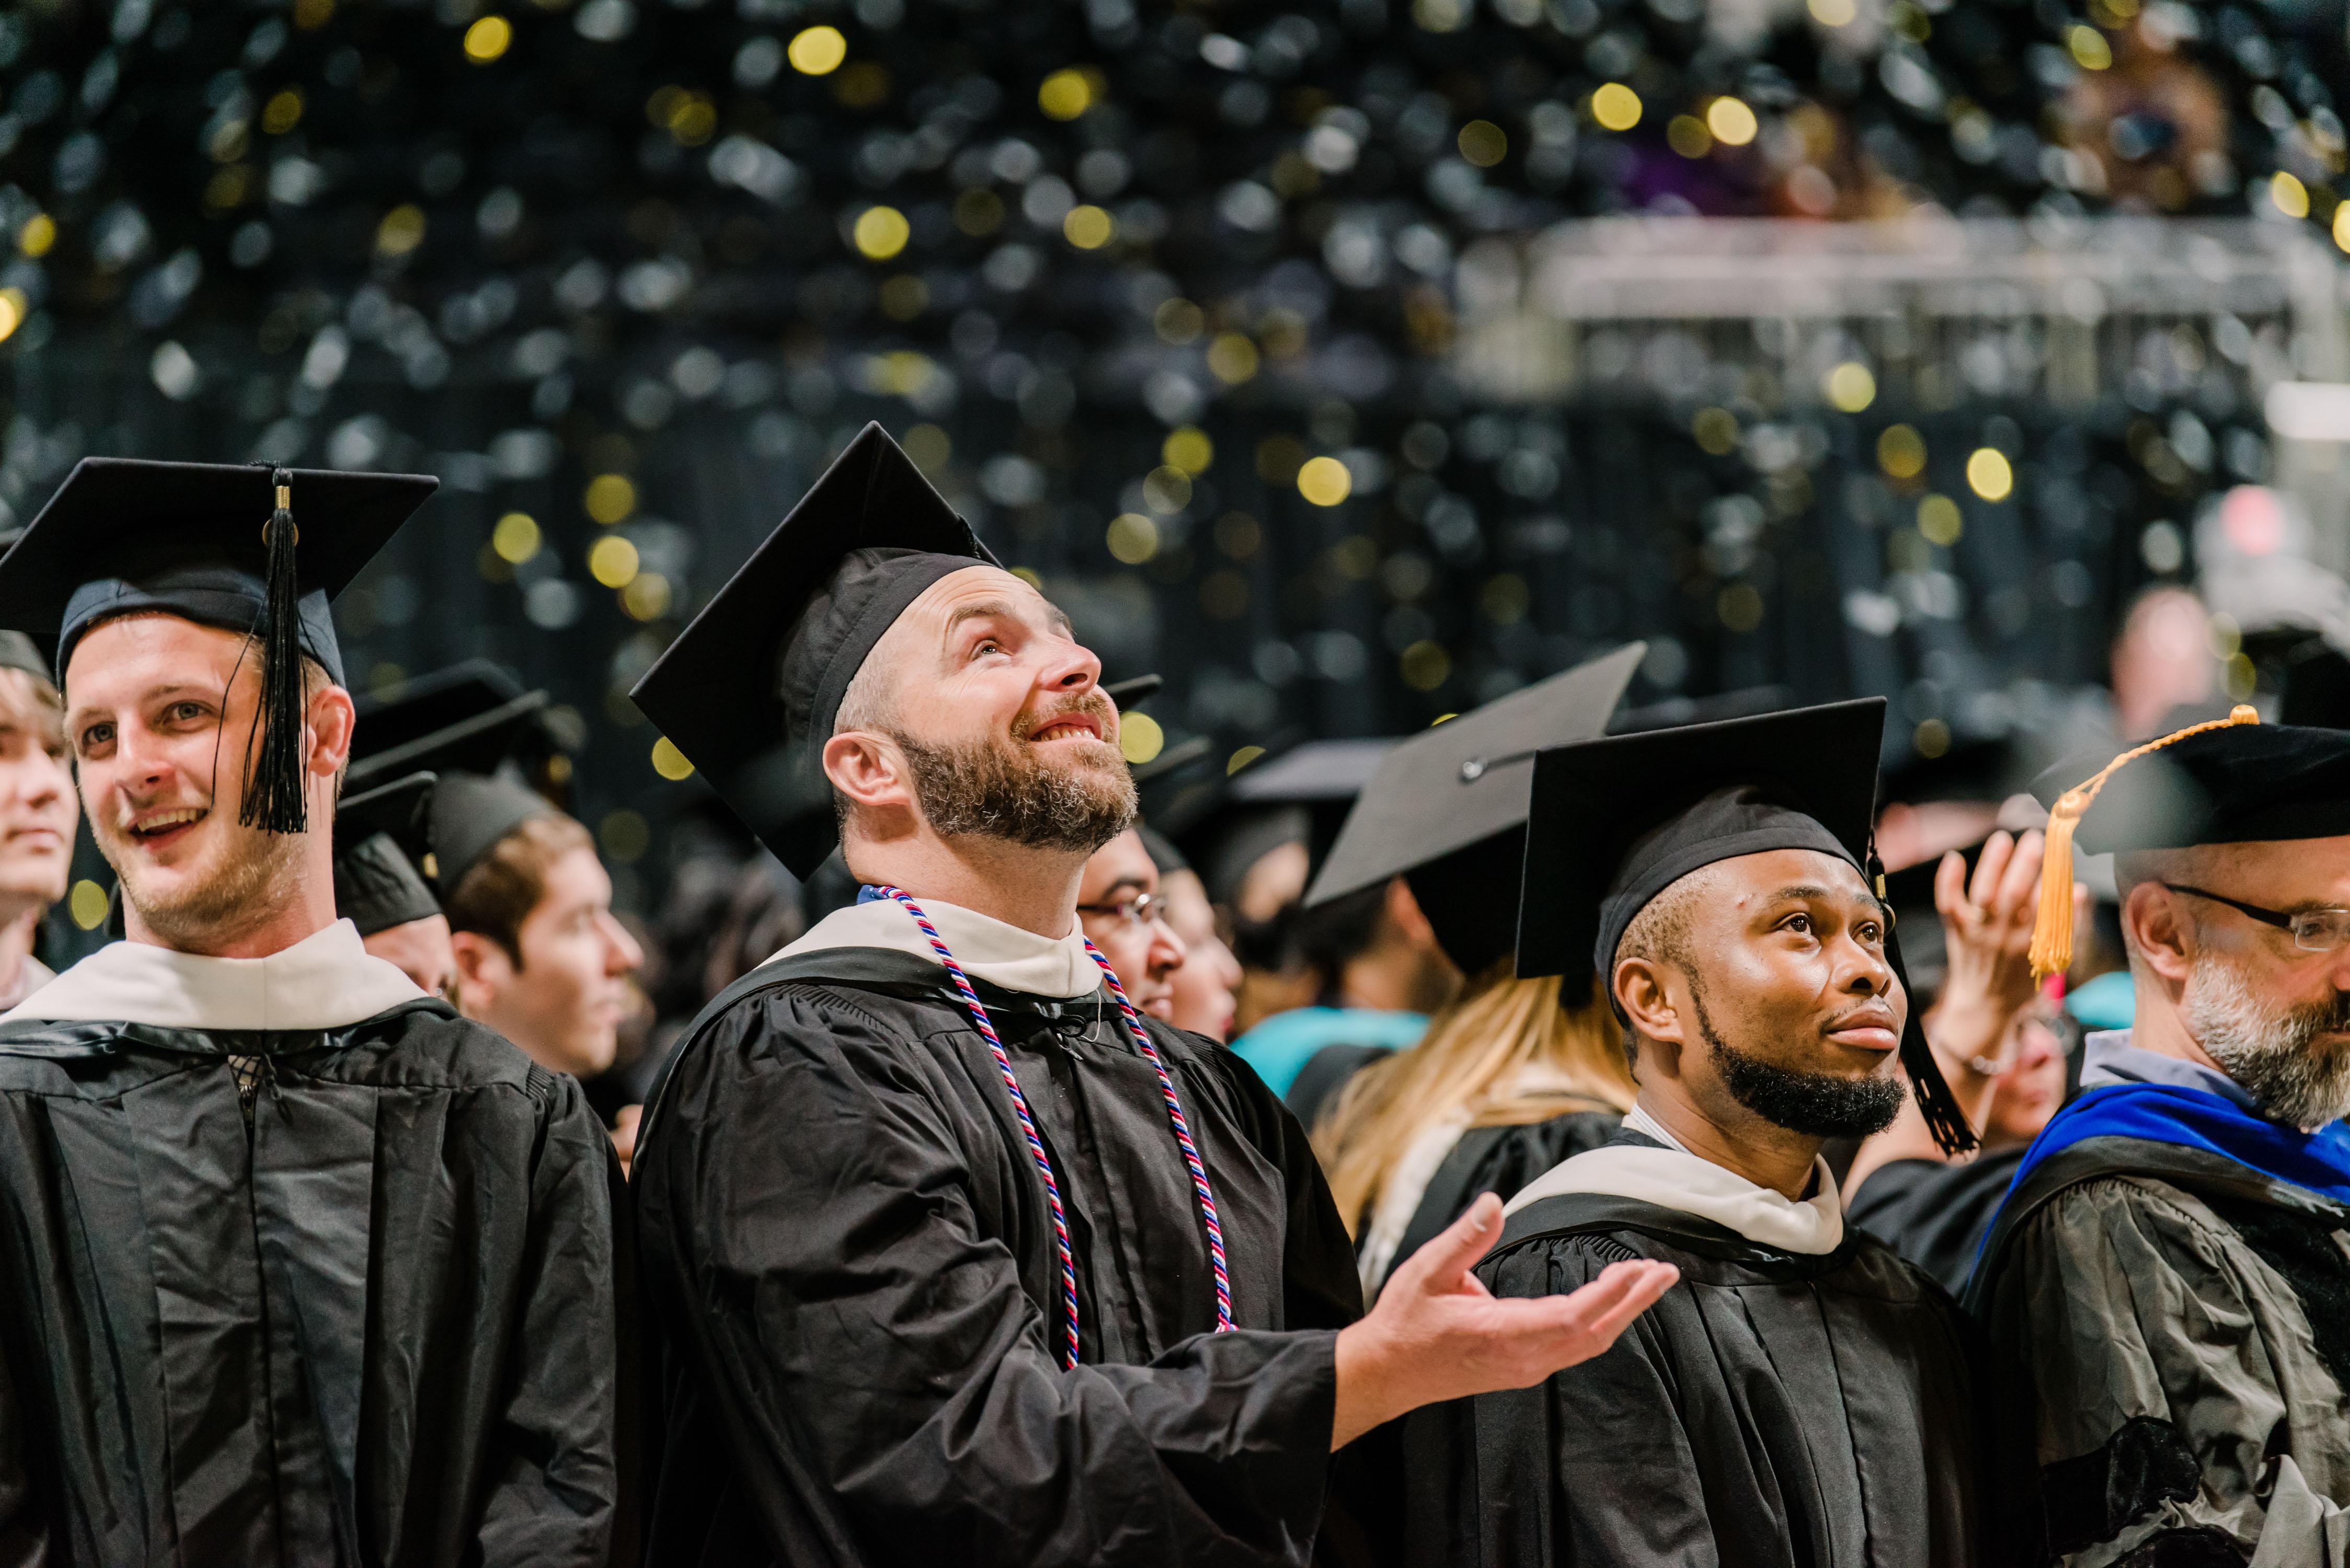 Graduate smiles up at confetti at graduation